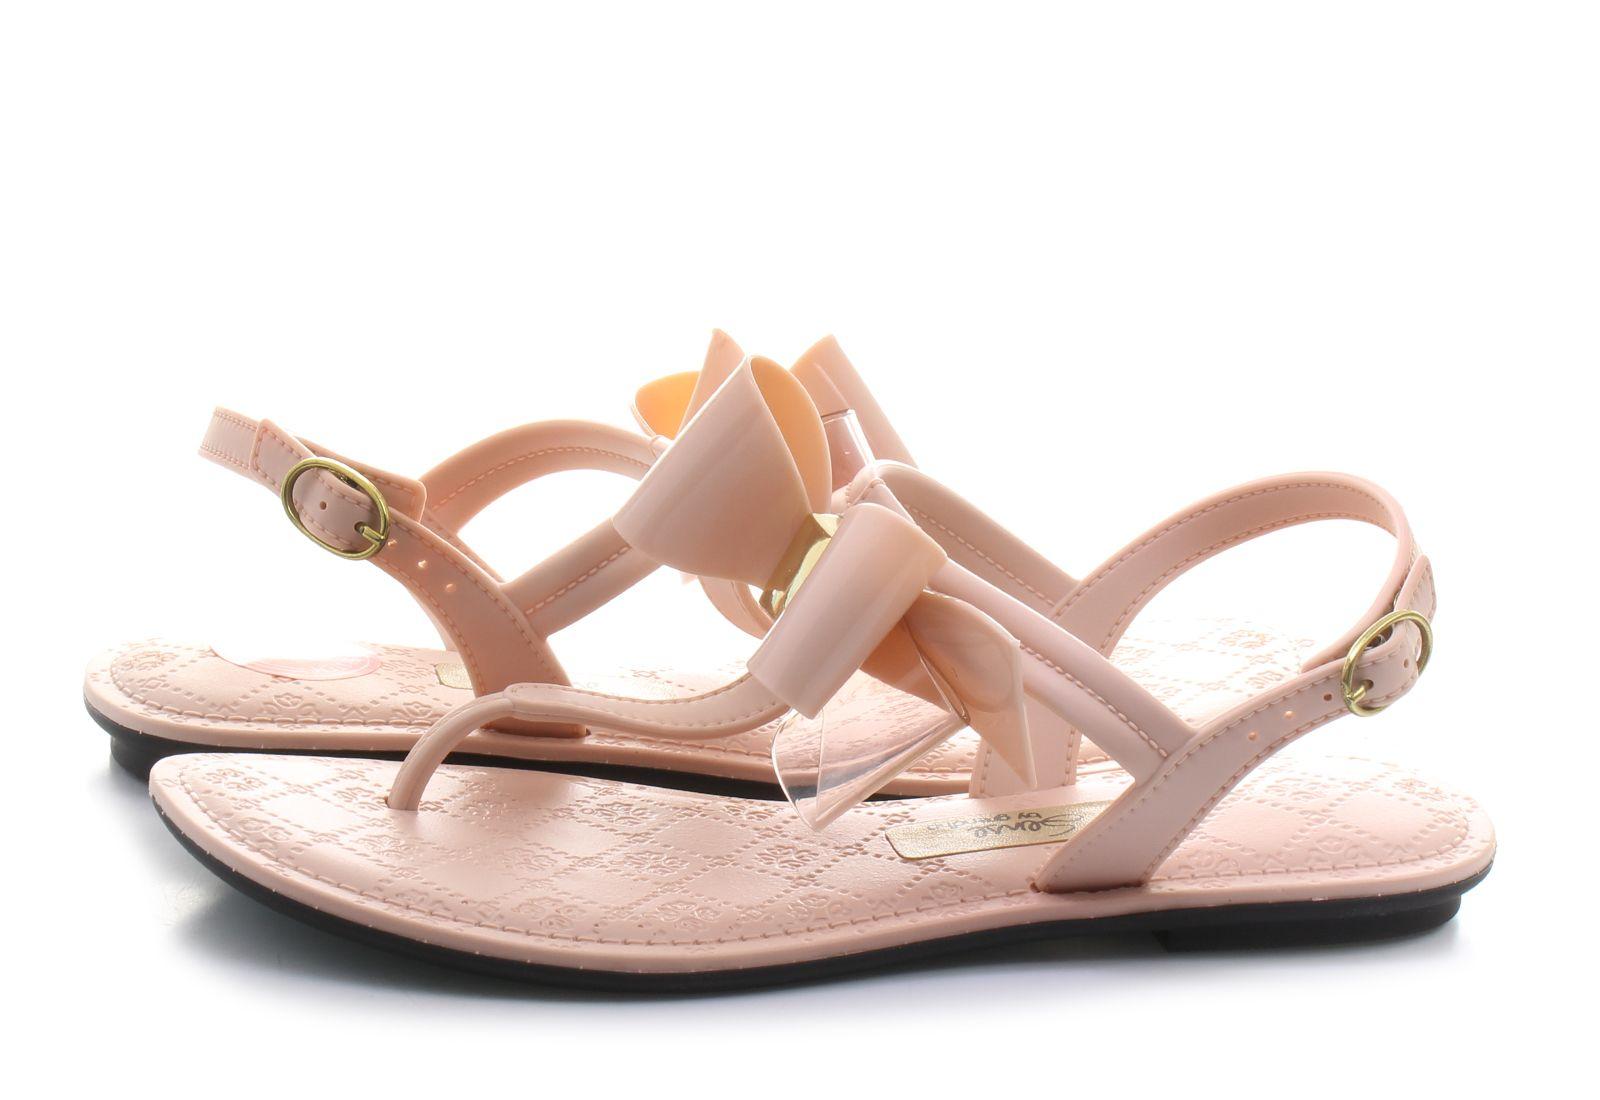 1a02dee7ab8 Grendha Sandals - Sense Sandal - 82073-90059 - Online shop for ...